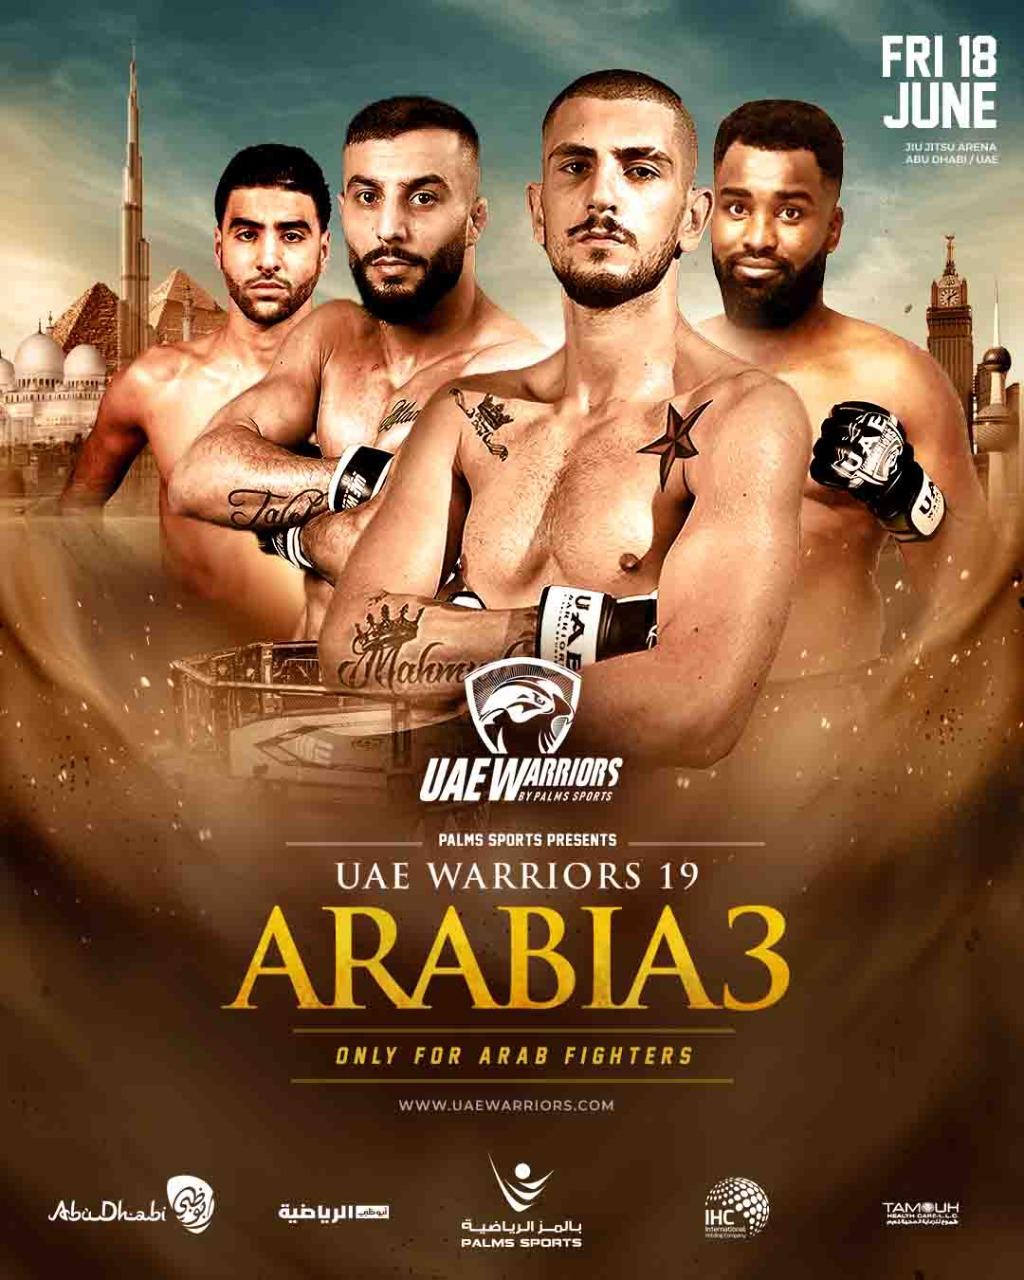 UAE Warriors 19